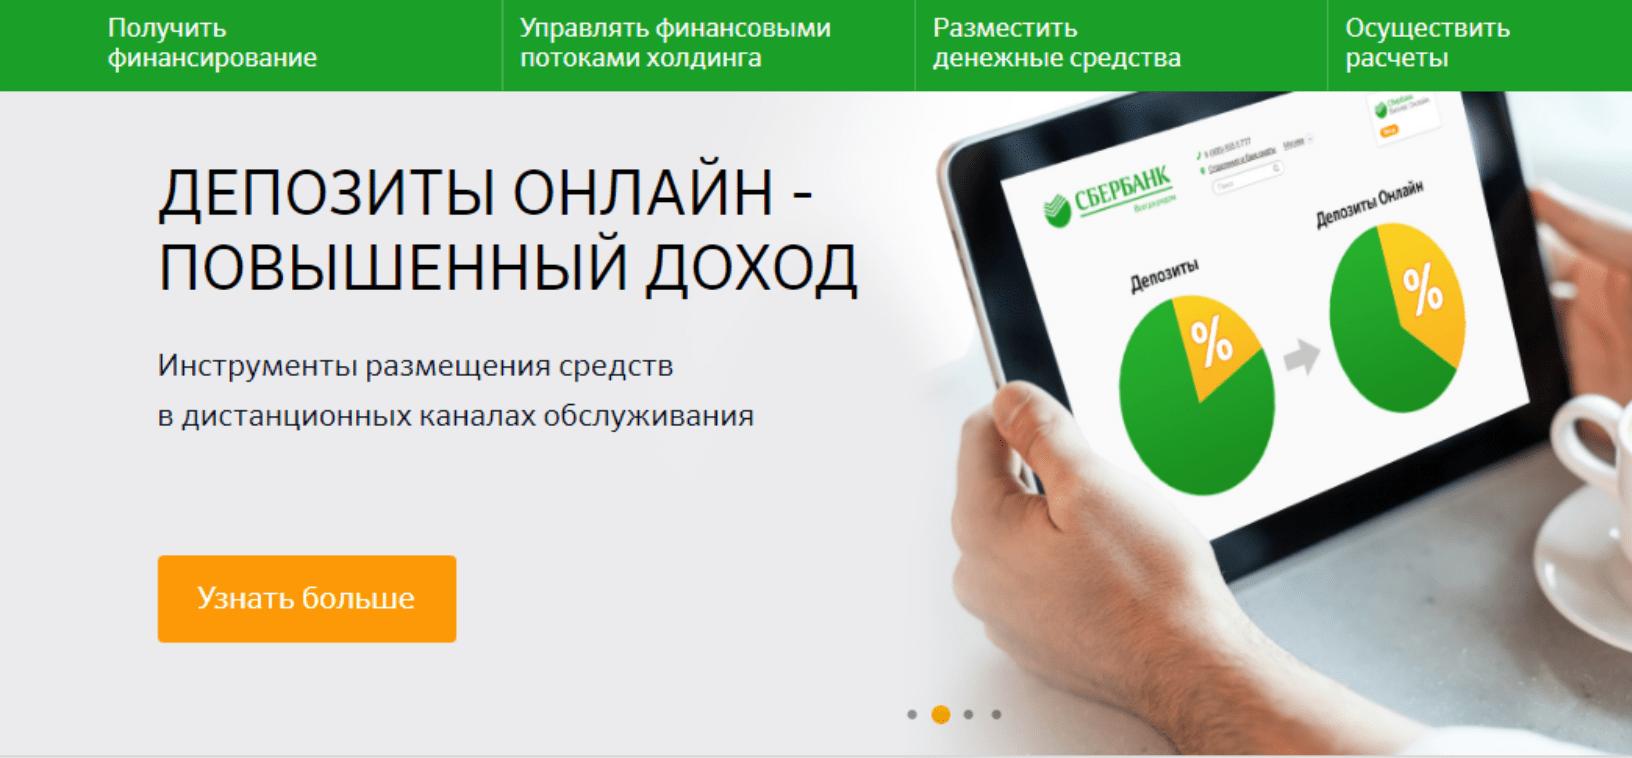 вход в интернет банк сбербанк бизнес онлайн